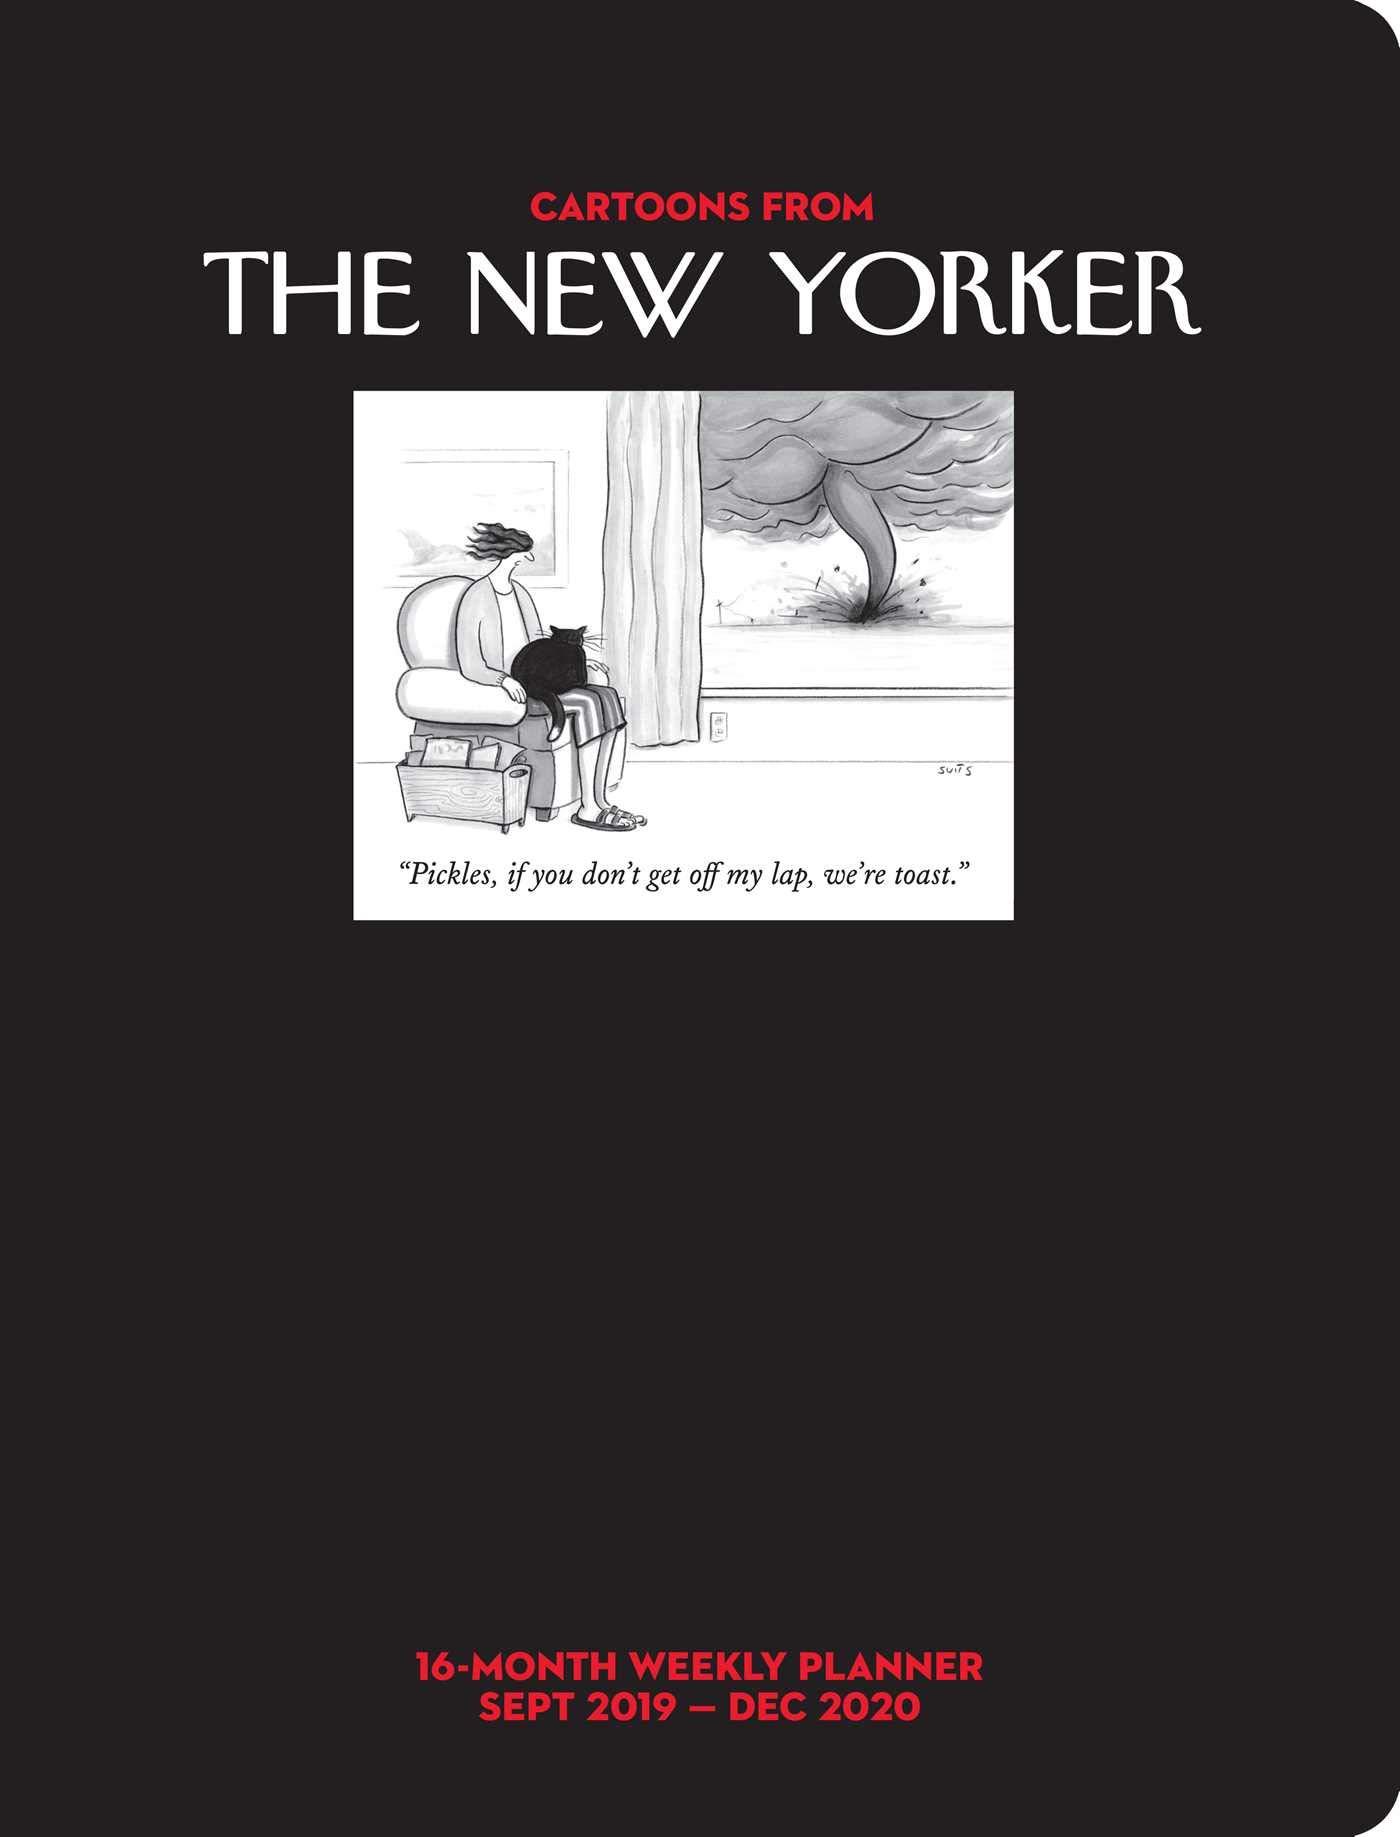 New Yorker December 5 2020 Desk Calendar Cartoons from The New Yorker 2019 2020 16 Month Weekly Planner